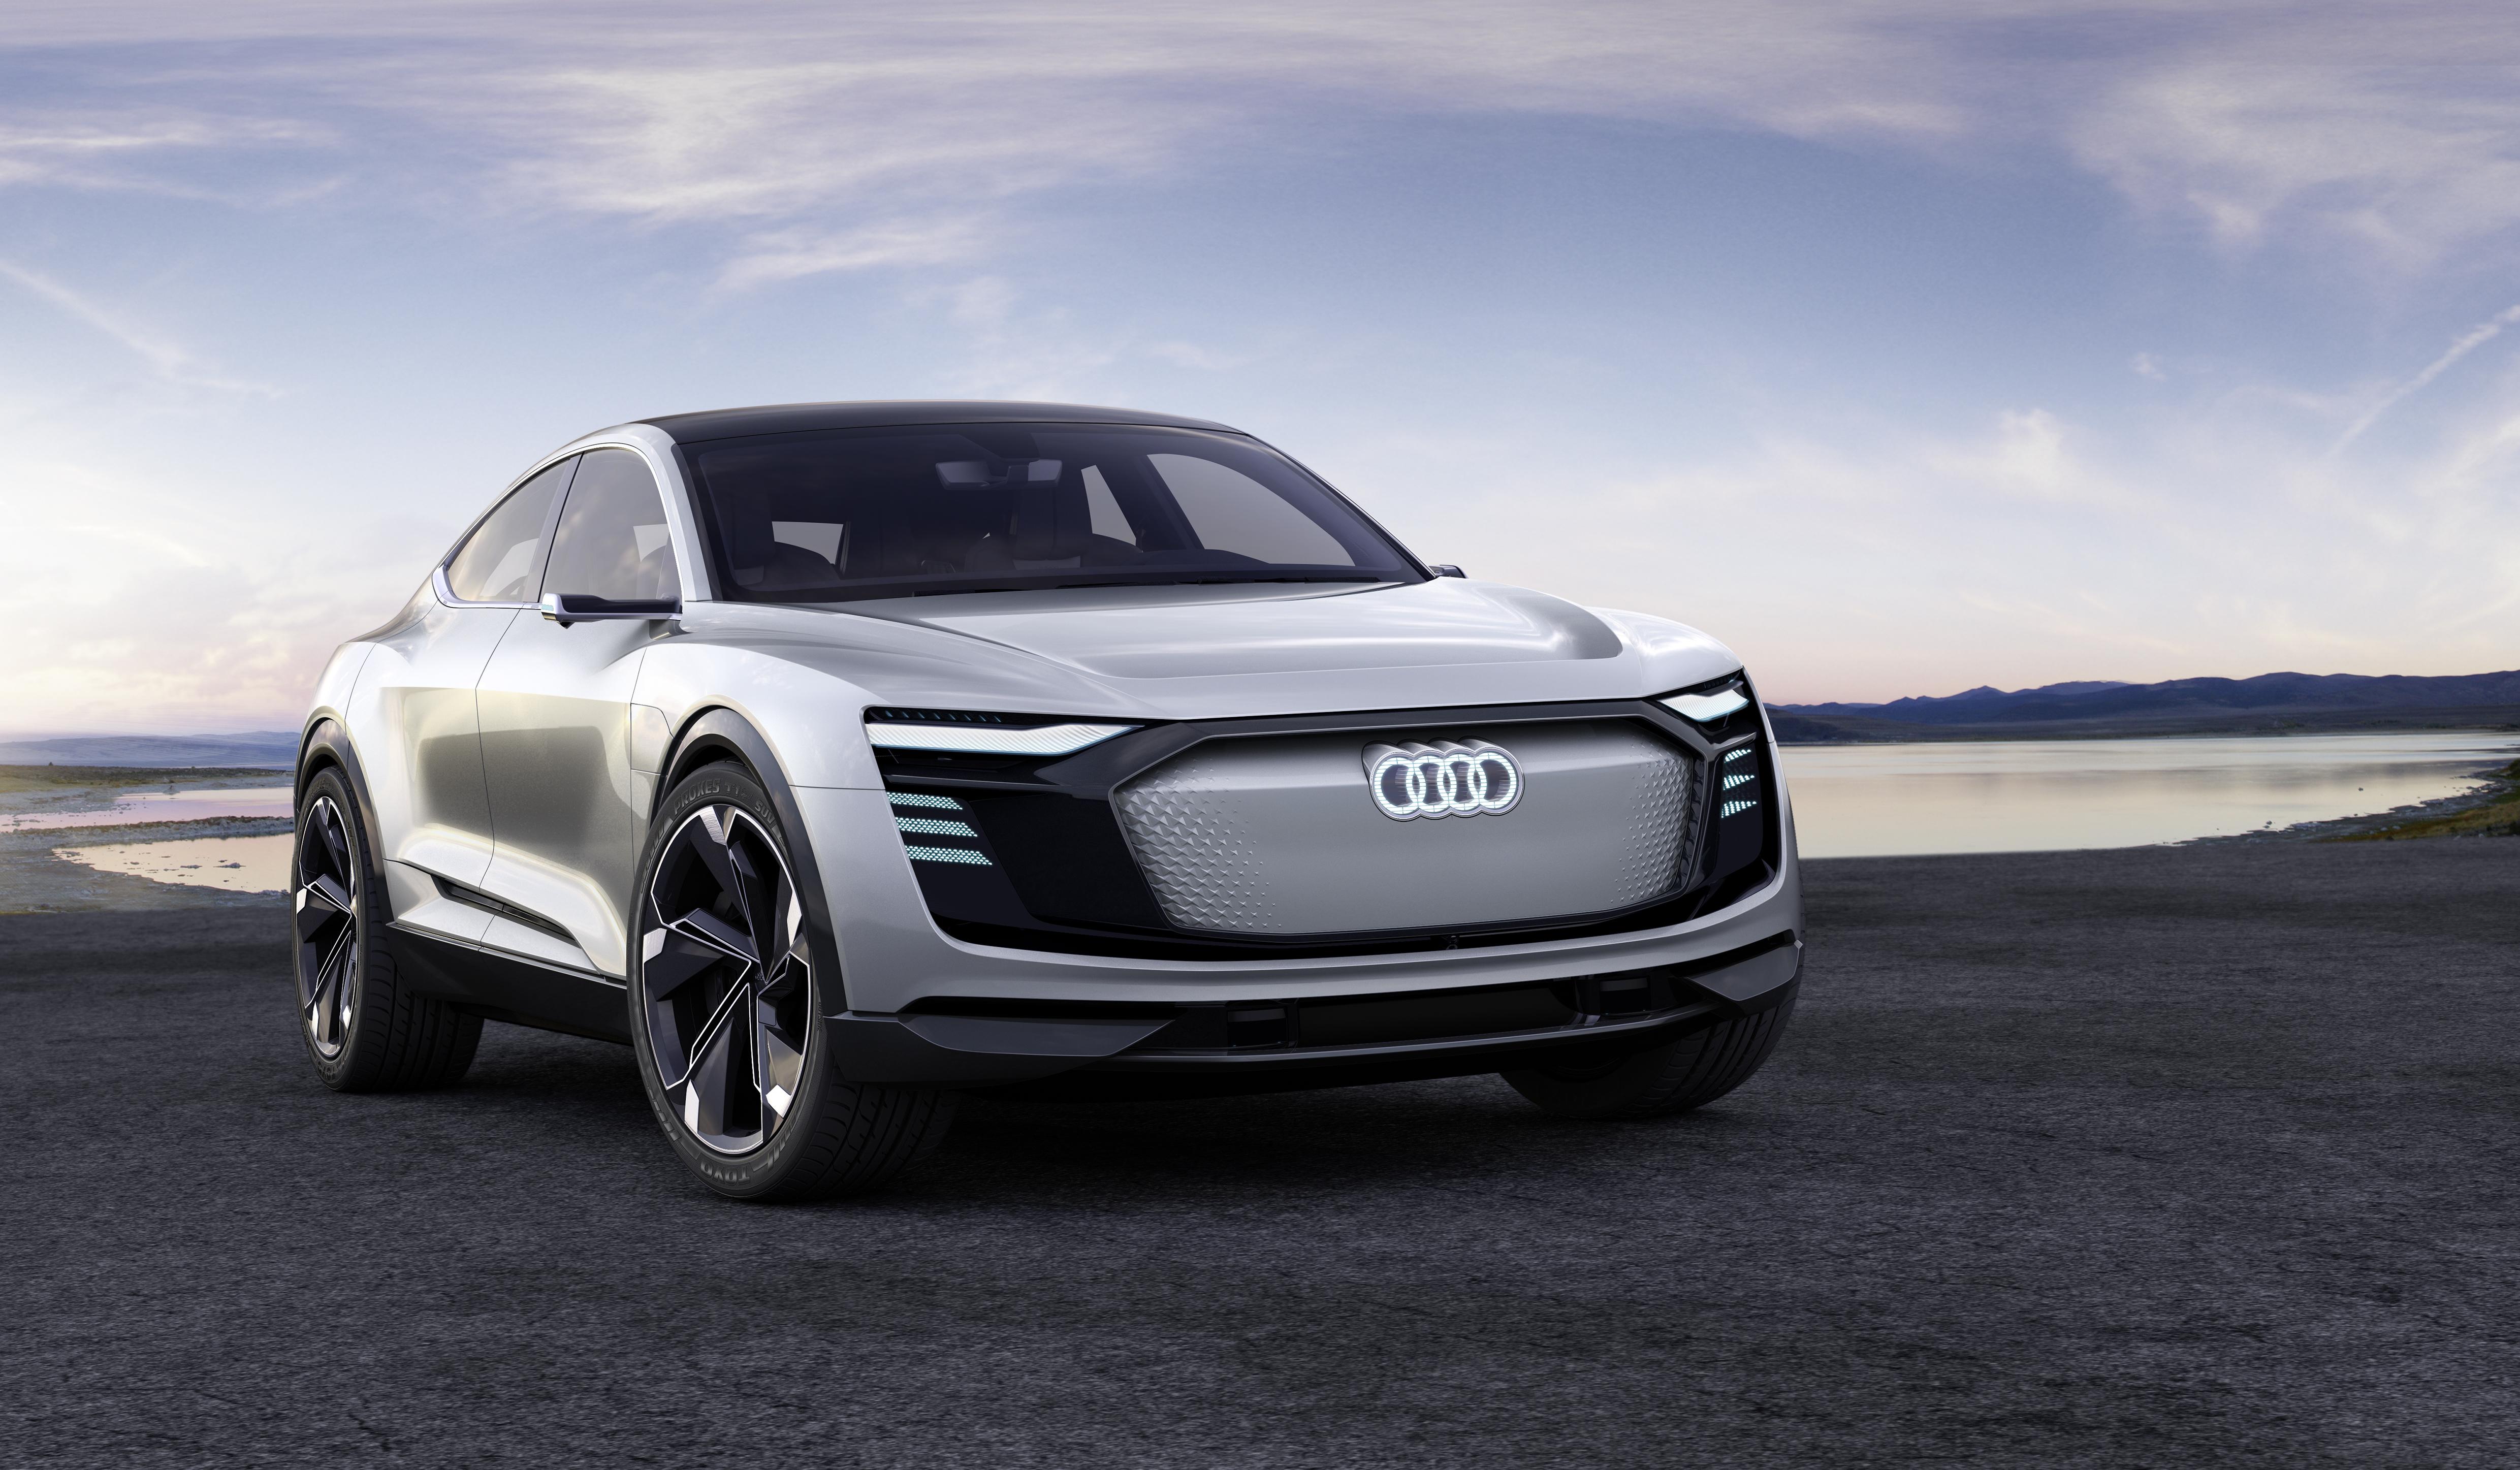 Audi zeigt Elektroauto e-tron Sportback concept